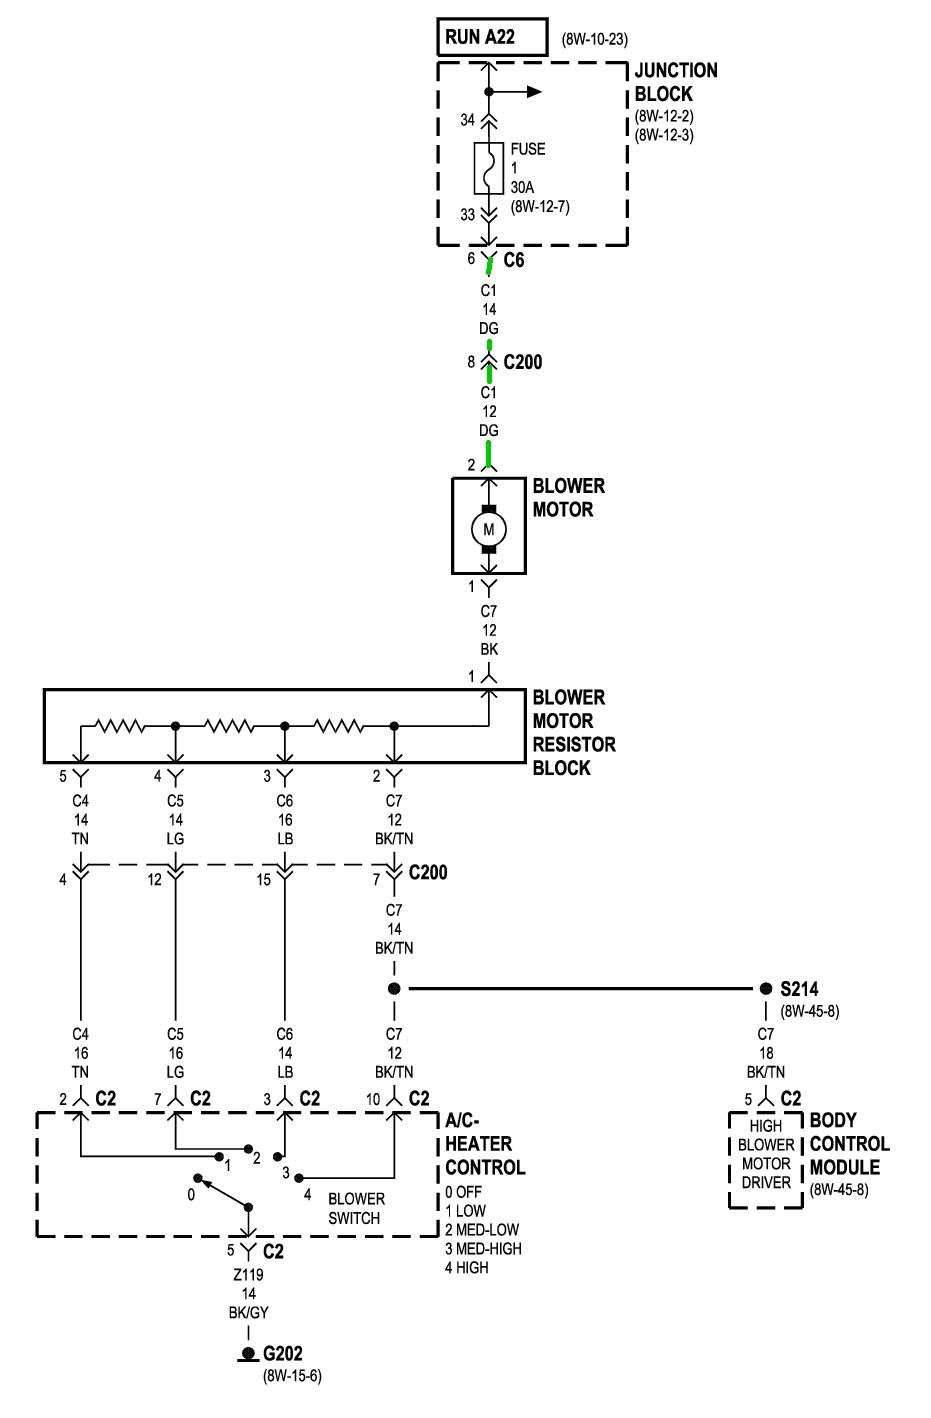 2005 Chrysler Sebring Convertible Fuse Diagram - wiring ... on roof diagram, light box diagram, control box diagram, fuse tv, fuse wire, wiring box diagram, meter box diagram, fuel tank sending unit diagram, relay diagram, heater box diagram, 2002 sebring box diagram, junction box diagram, fuel pump diagram, element box diagram, fuse line diagram, power box diagram, circuit breaker diagram, engine diagram, oxygen box diagram, gear box diagram,